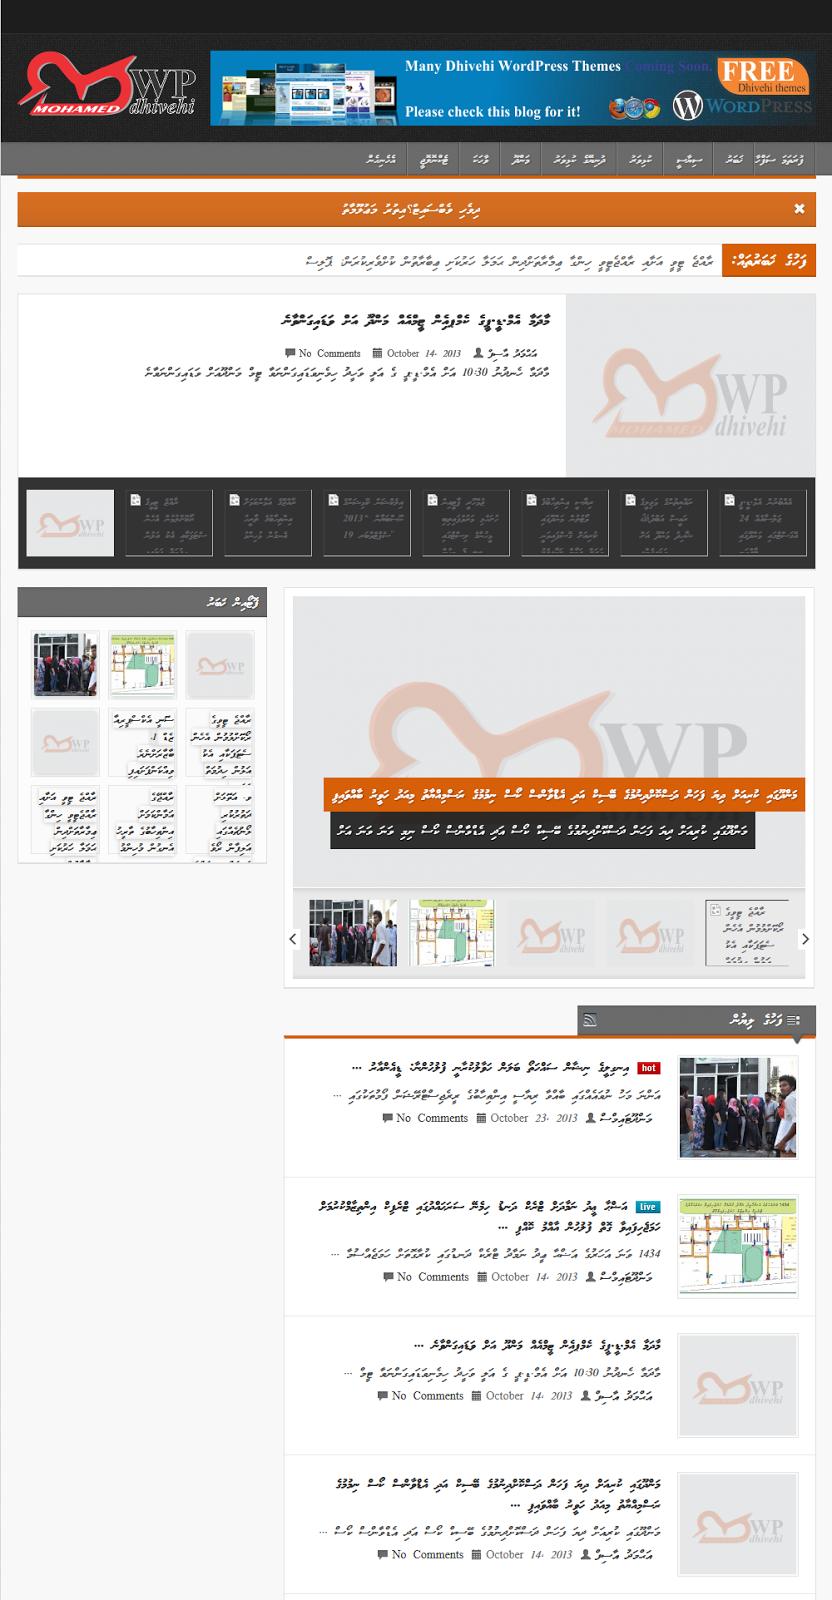 wordpress dhivehi themes wordpress gobolhi theme for free download